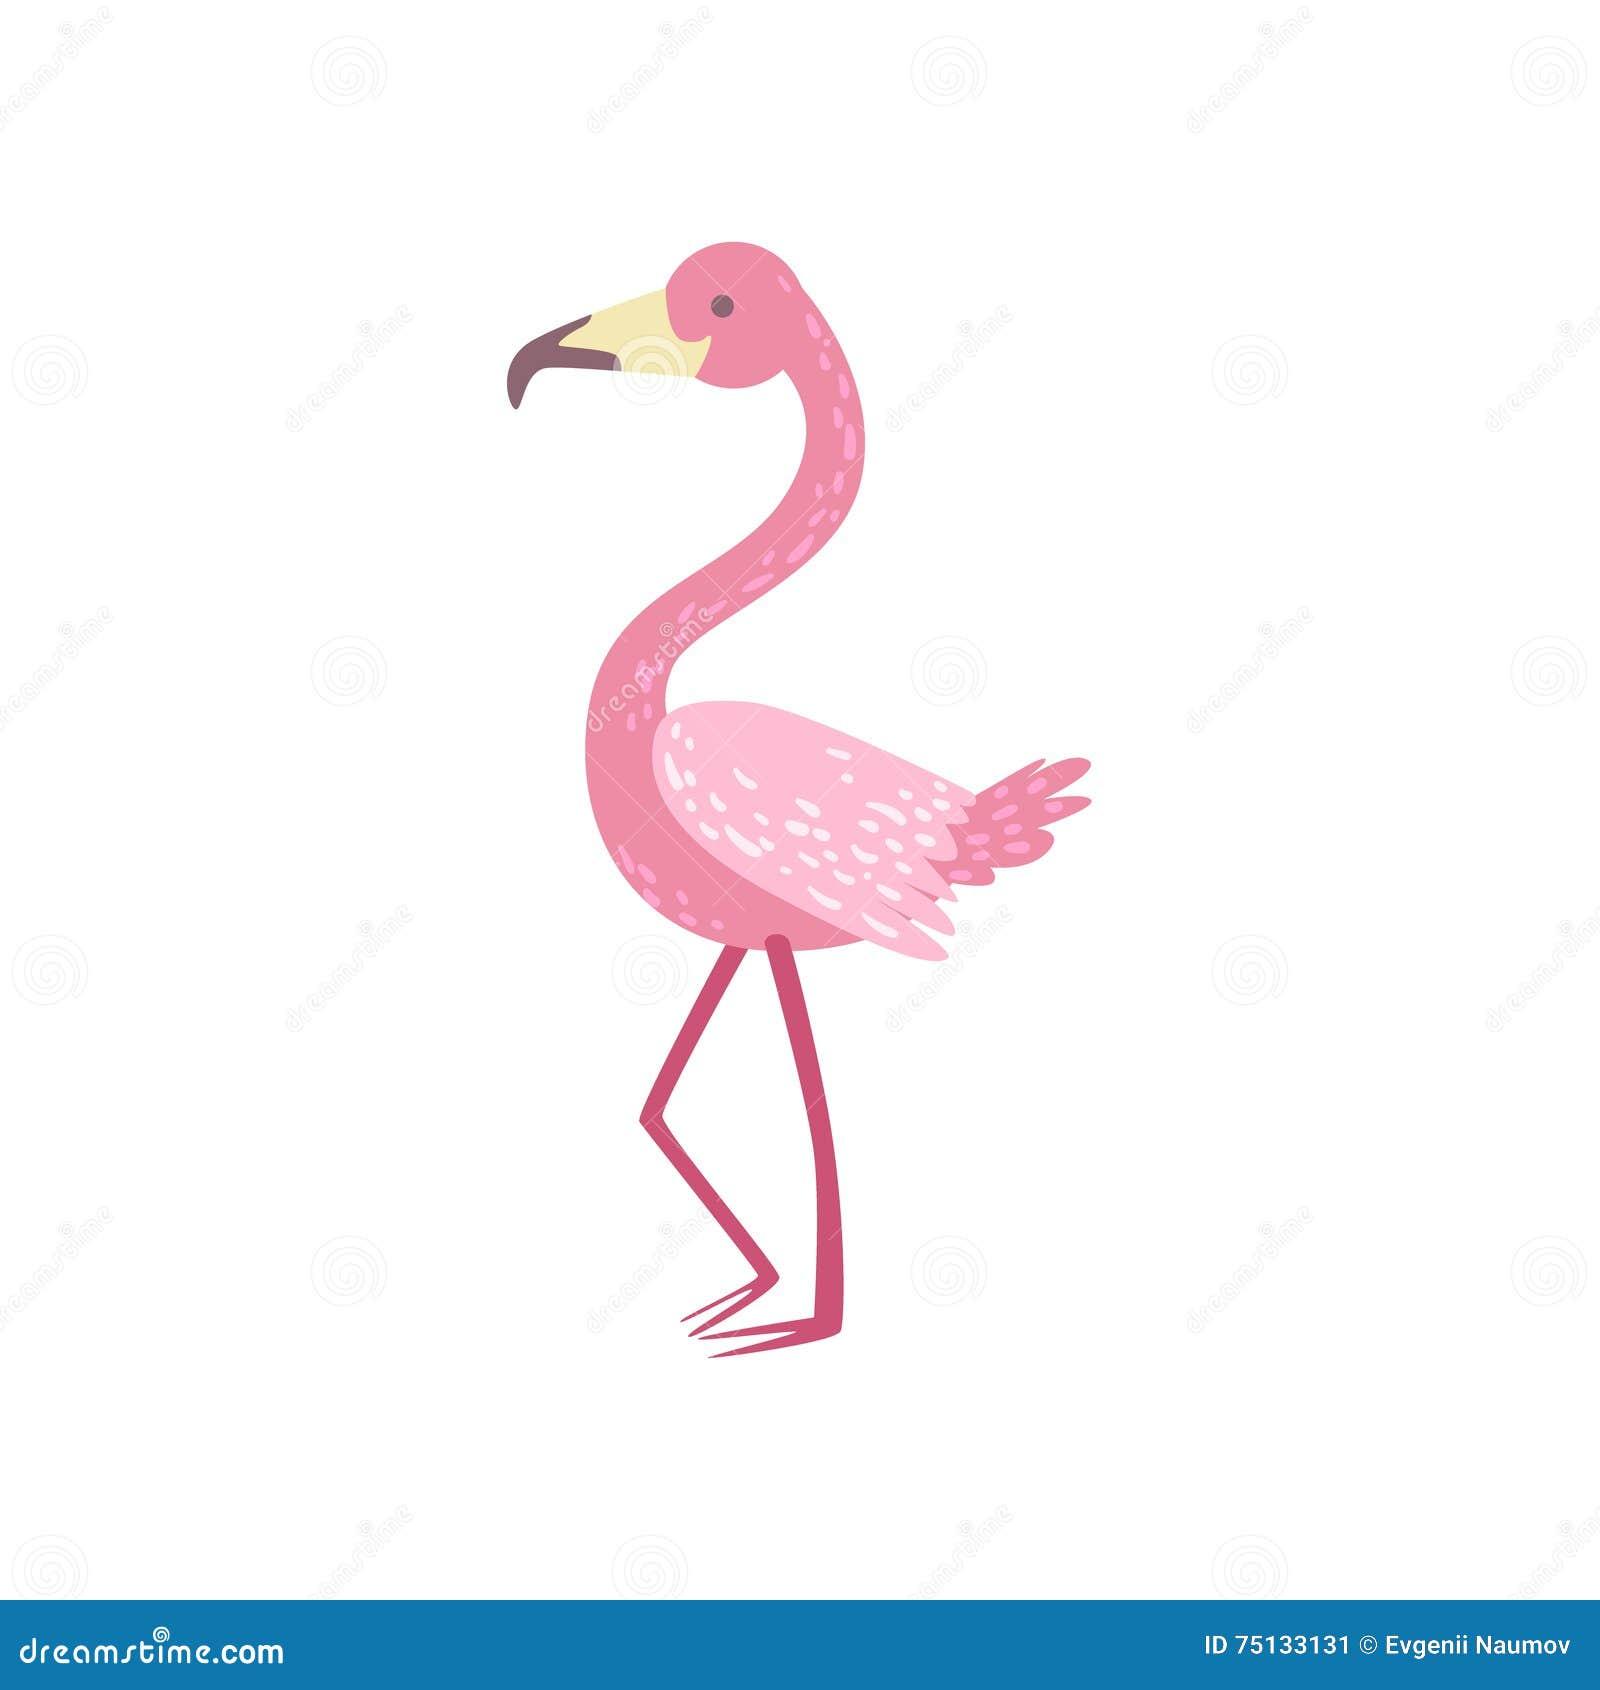 Pink Flamingo Stylized Childish Drawing Stock Vector